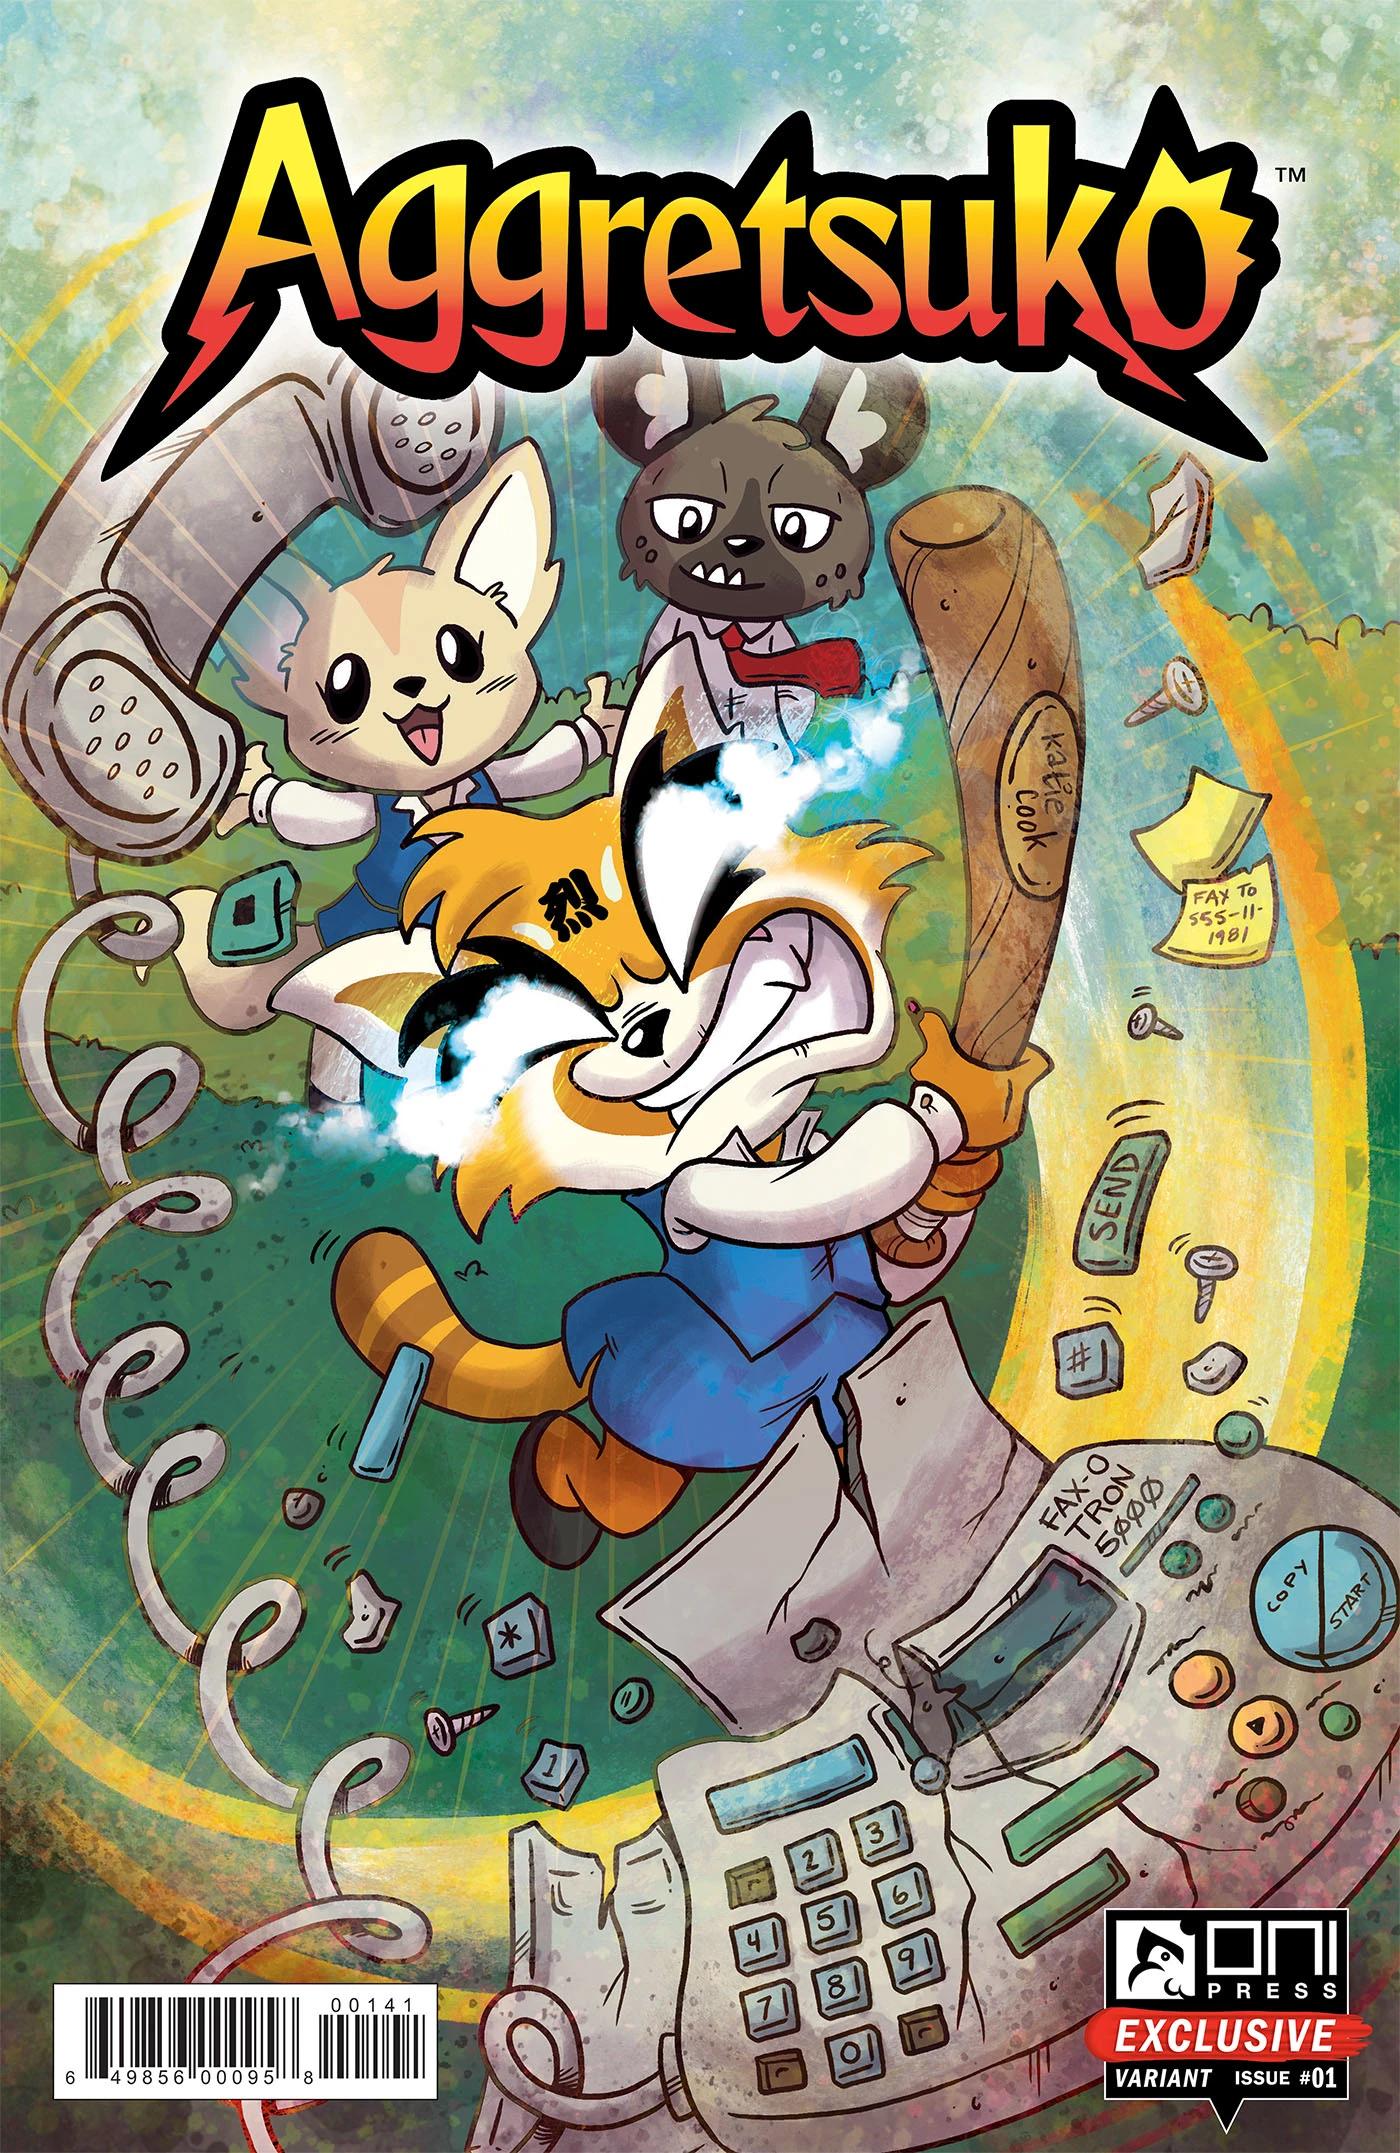 Aggretsuko Comic Issue1 CoverD.jpg